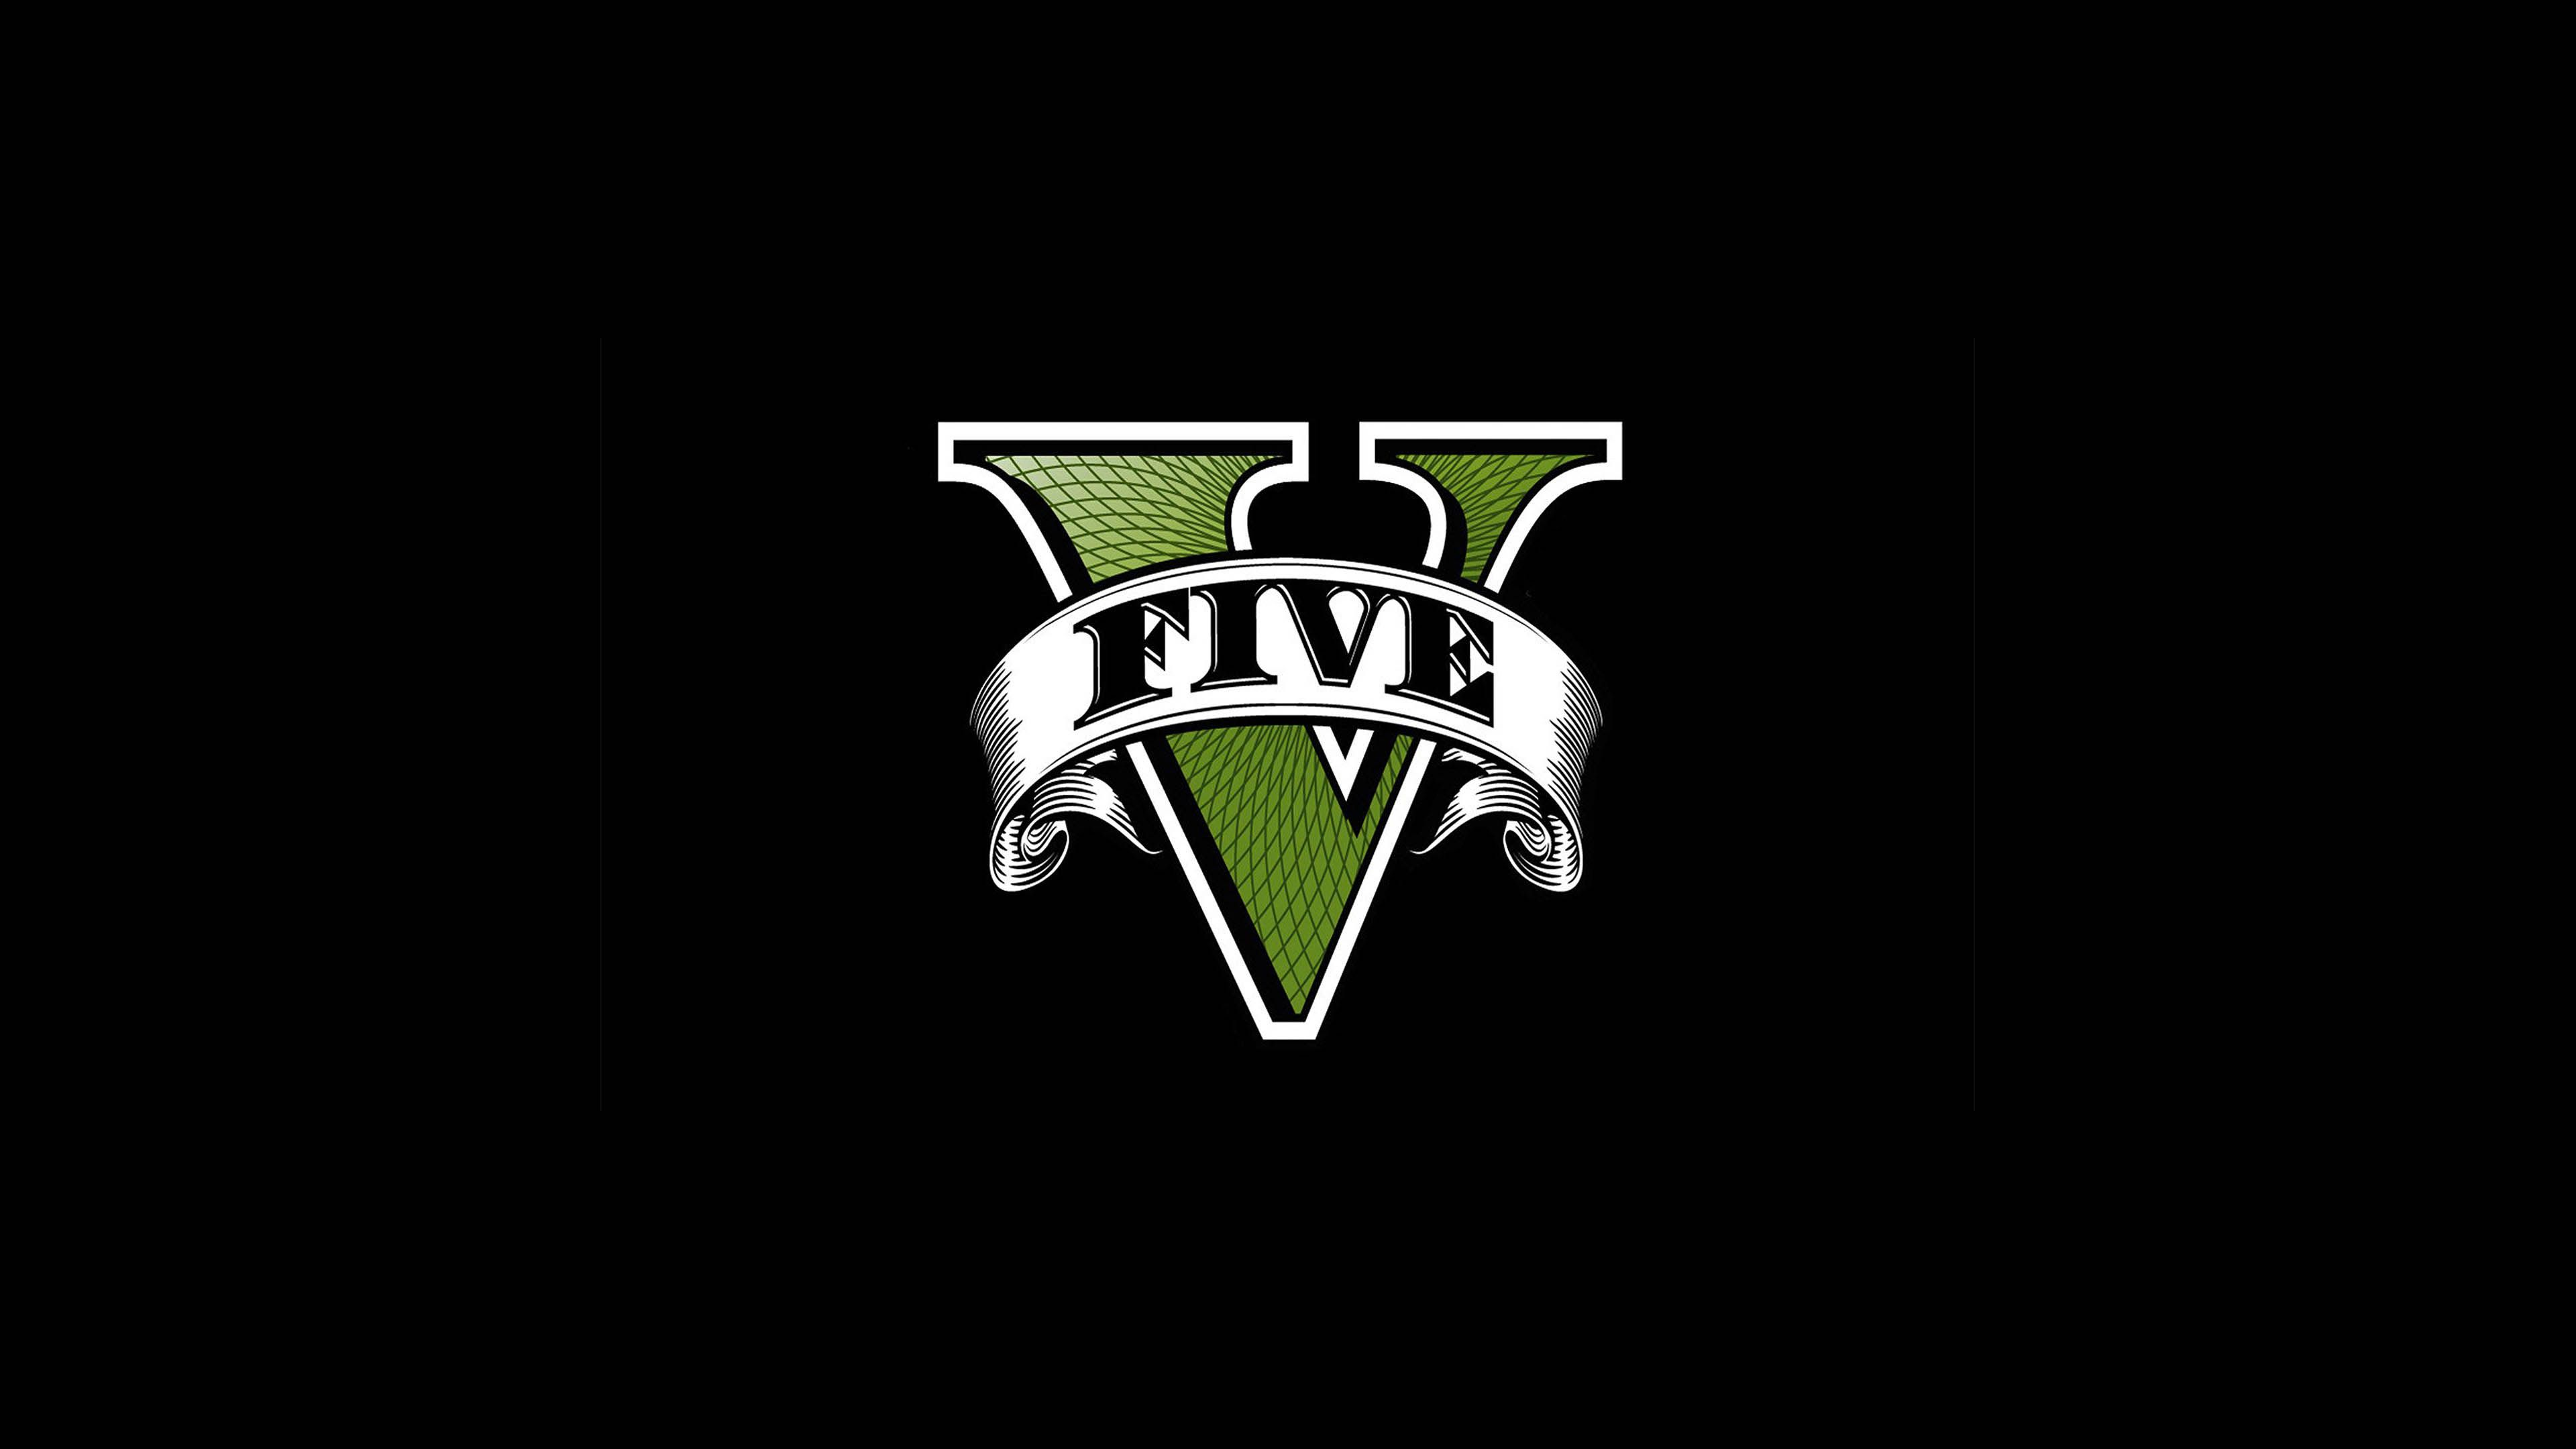 GTA 5 Five Logo 3840x2160 wallpaper | Video Games | Gta 5